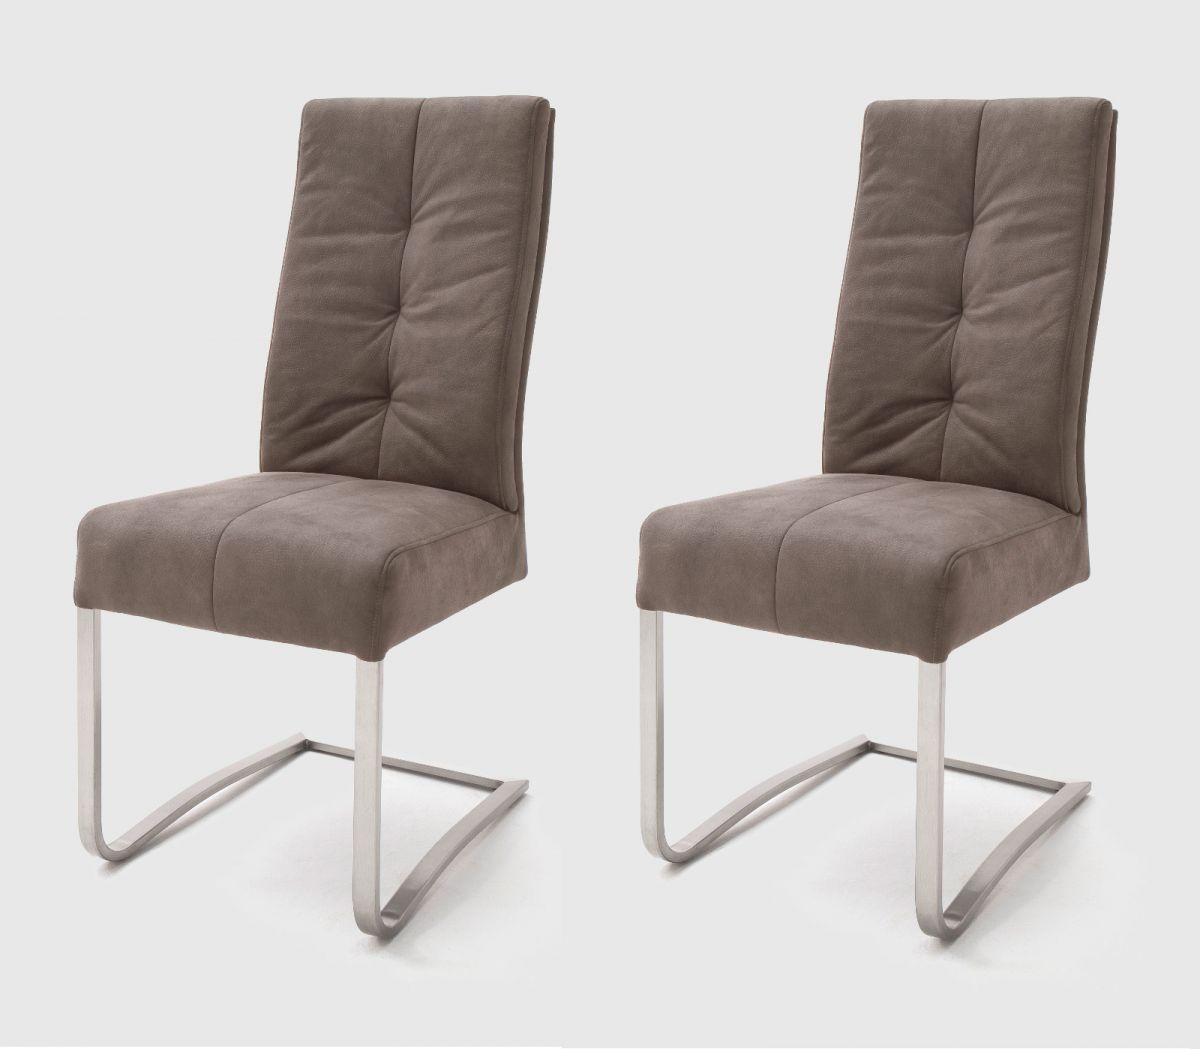 2 x Stuhl Salva Sand Schwinger